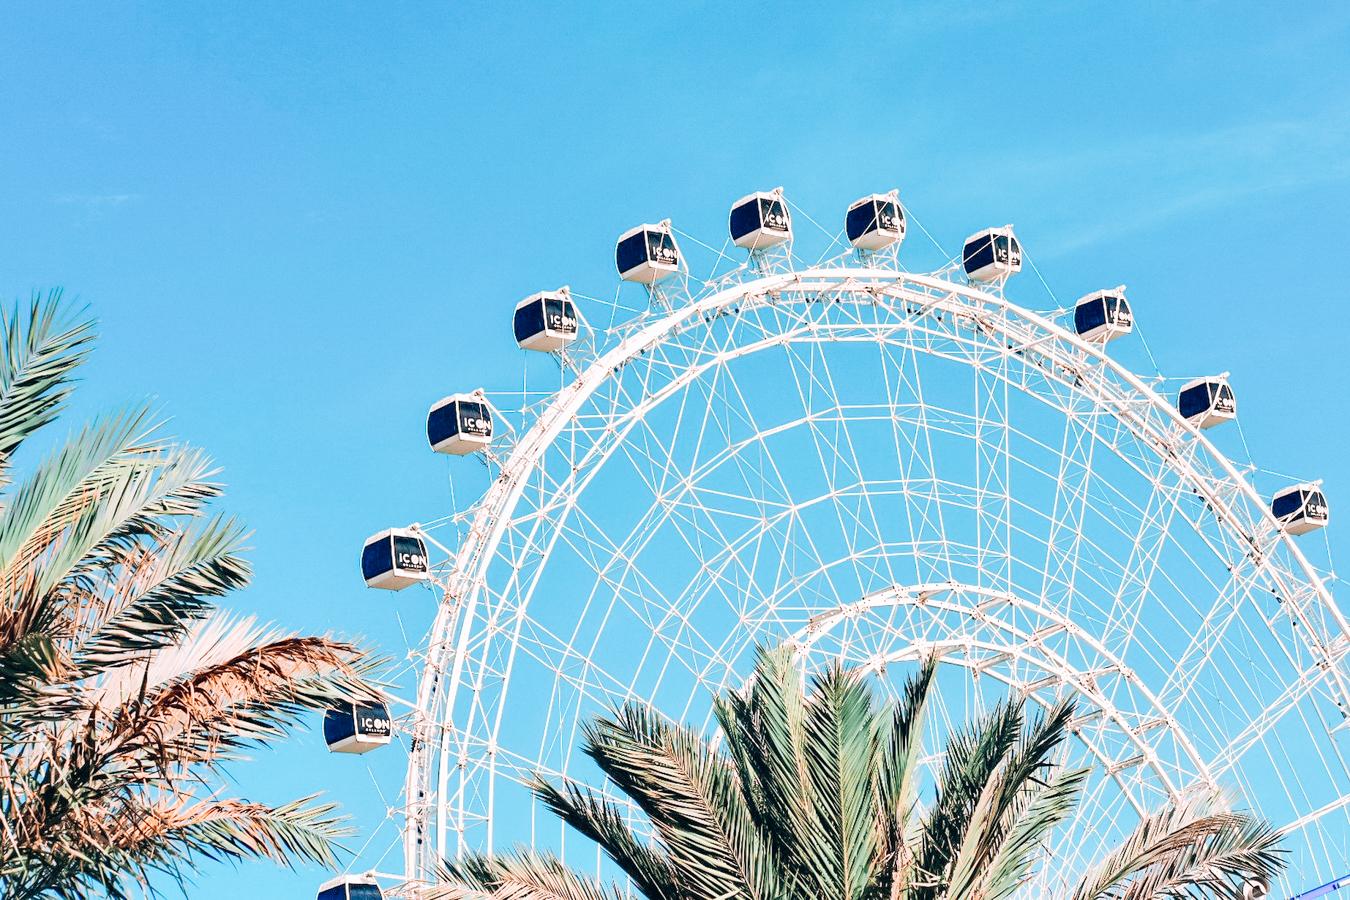 Ferris Wheel Wheel at ICON Park in Orlando